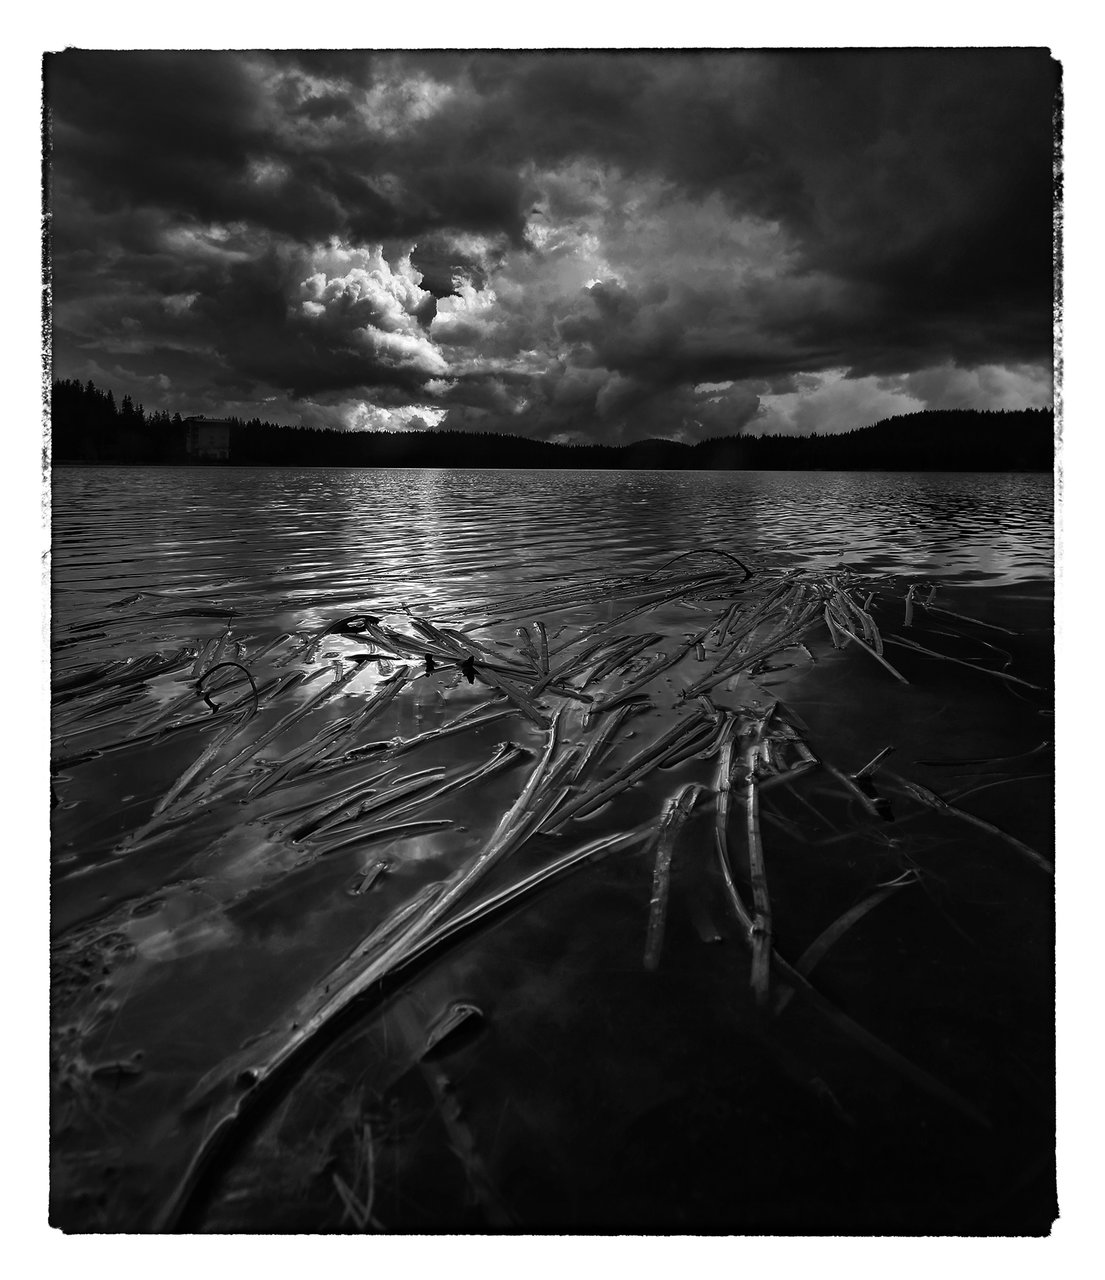 Photo in Nature | Author Milan Hristev - MAX-1 | PHOTO FORUM